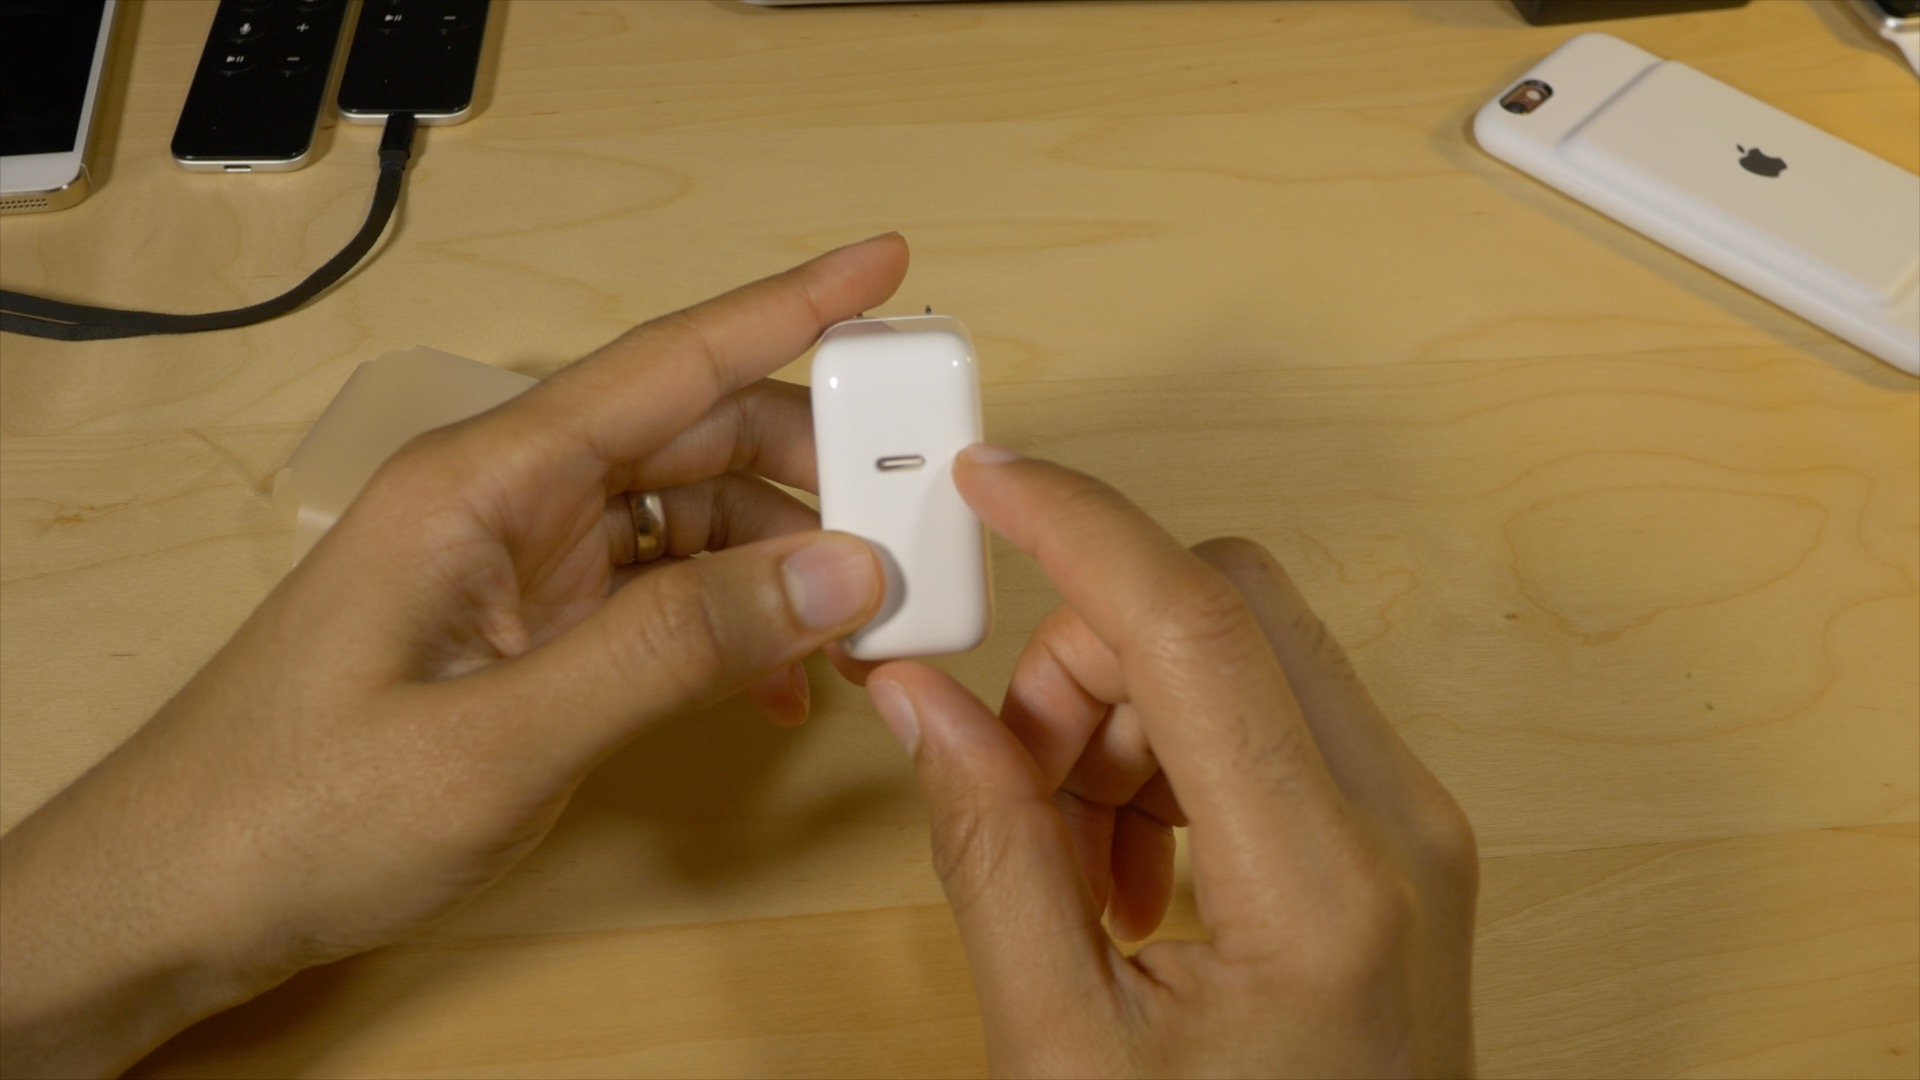 USB-C Power Adapter